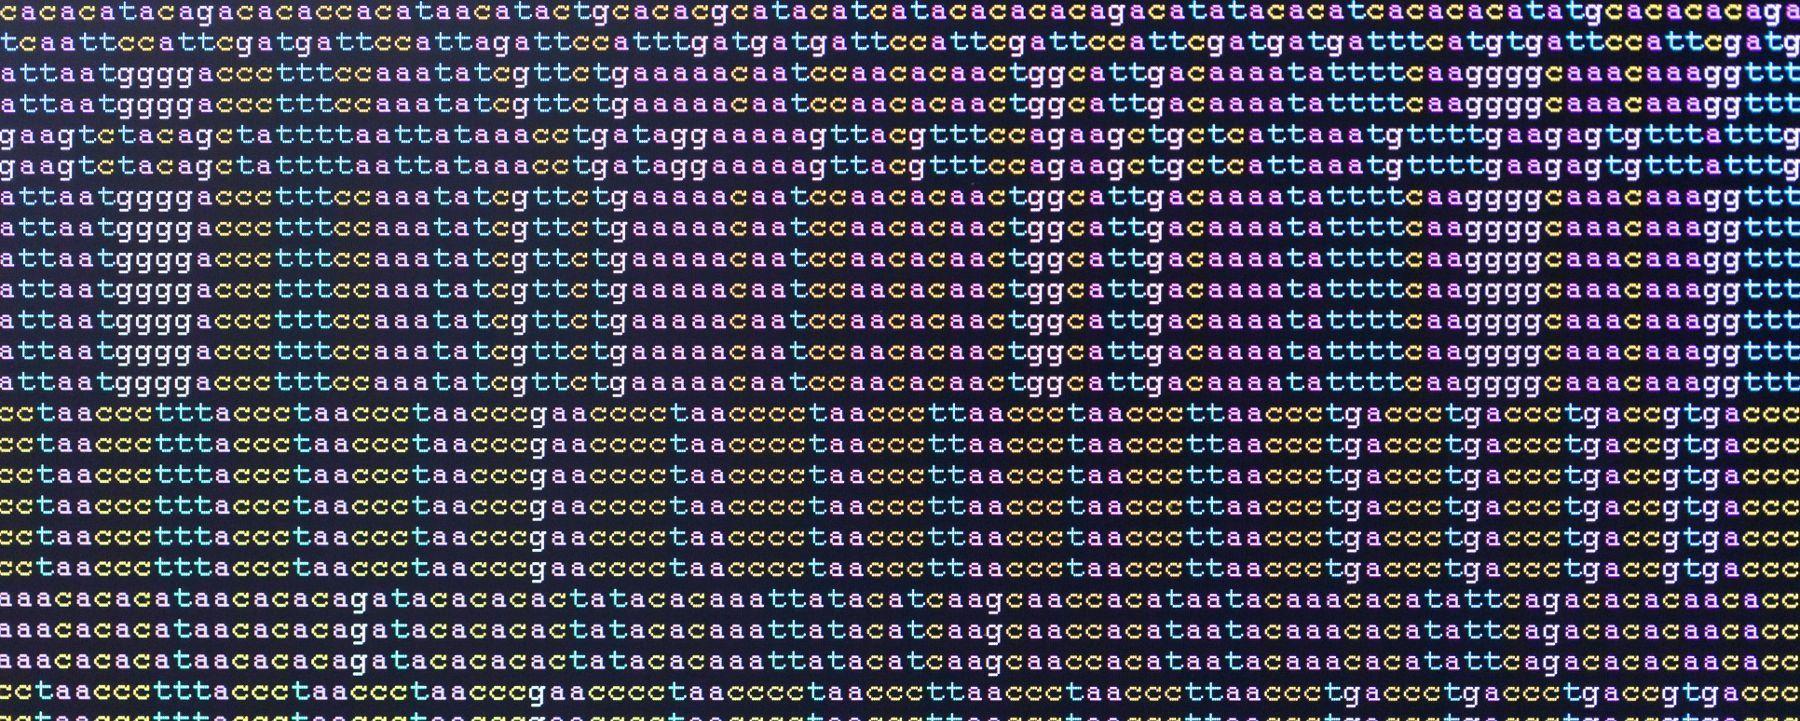 Remnants of Extinct Hominin Species Found in West African Genomes